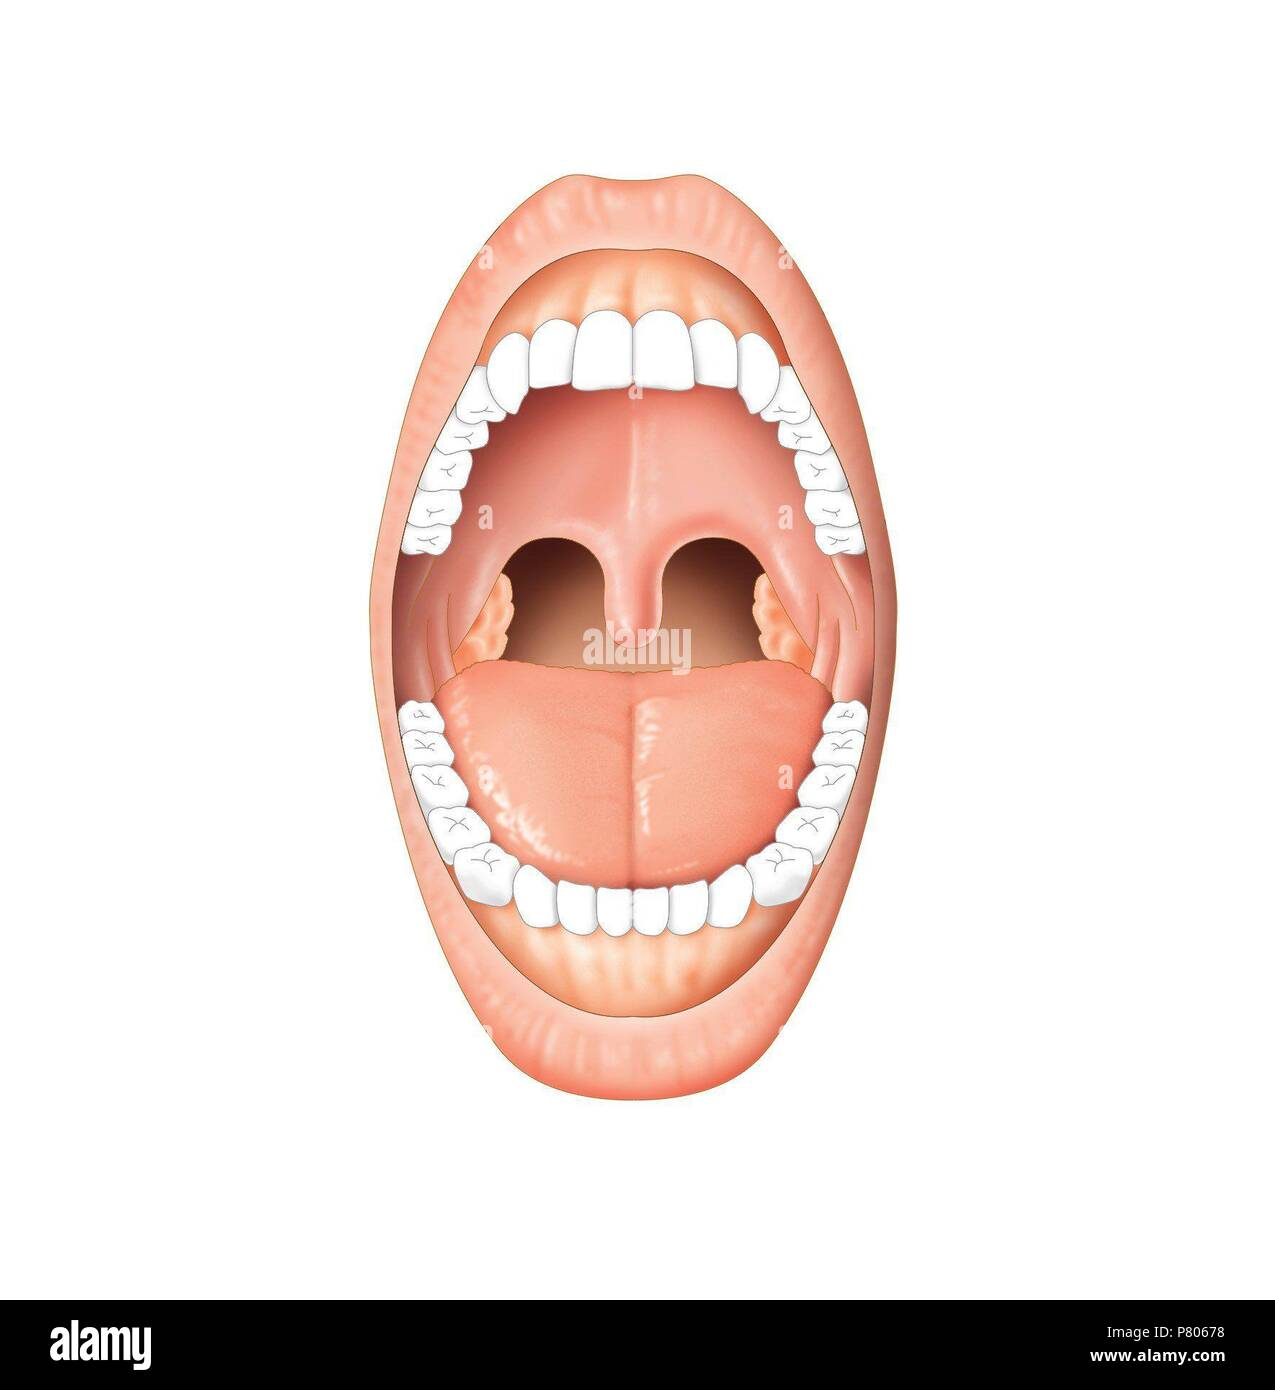 Mund Anatomie Stockfoto, Bild: 211446572 - Alamy